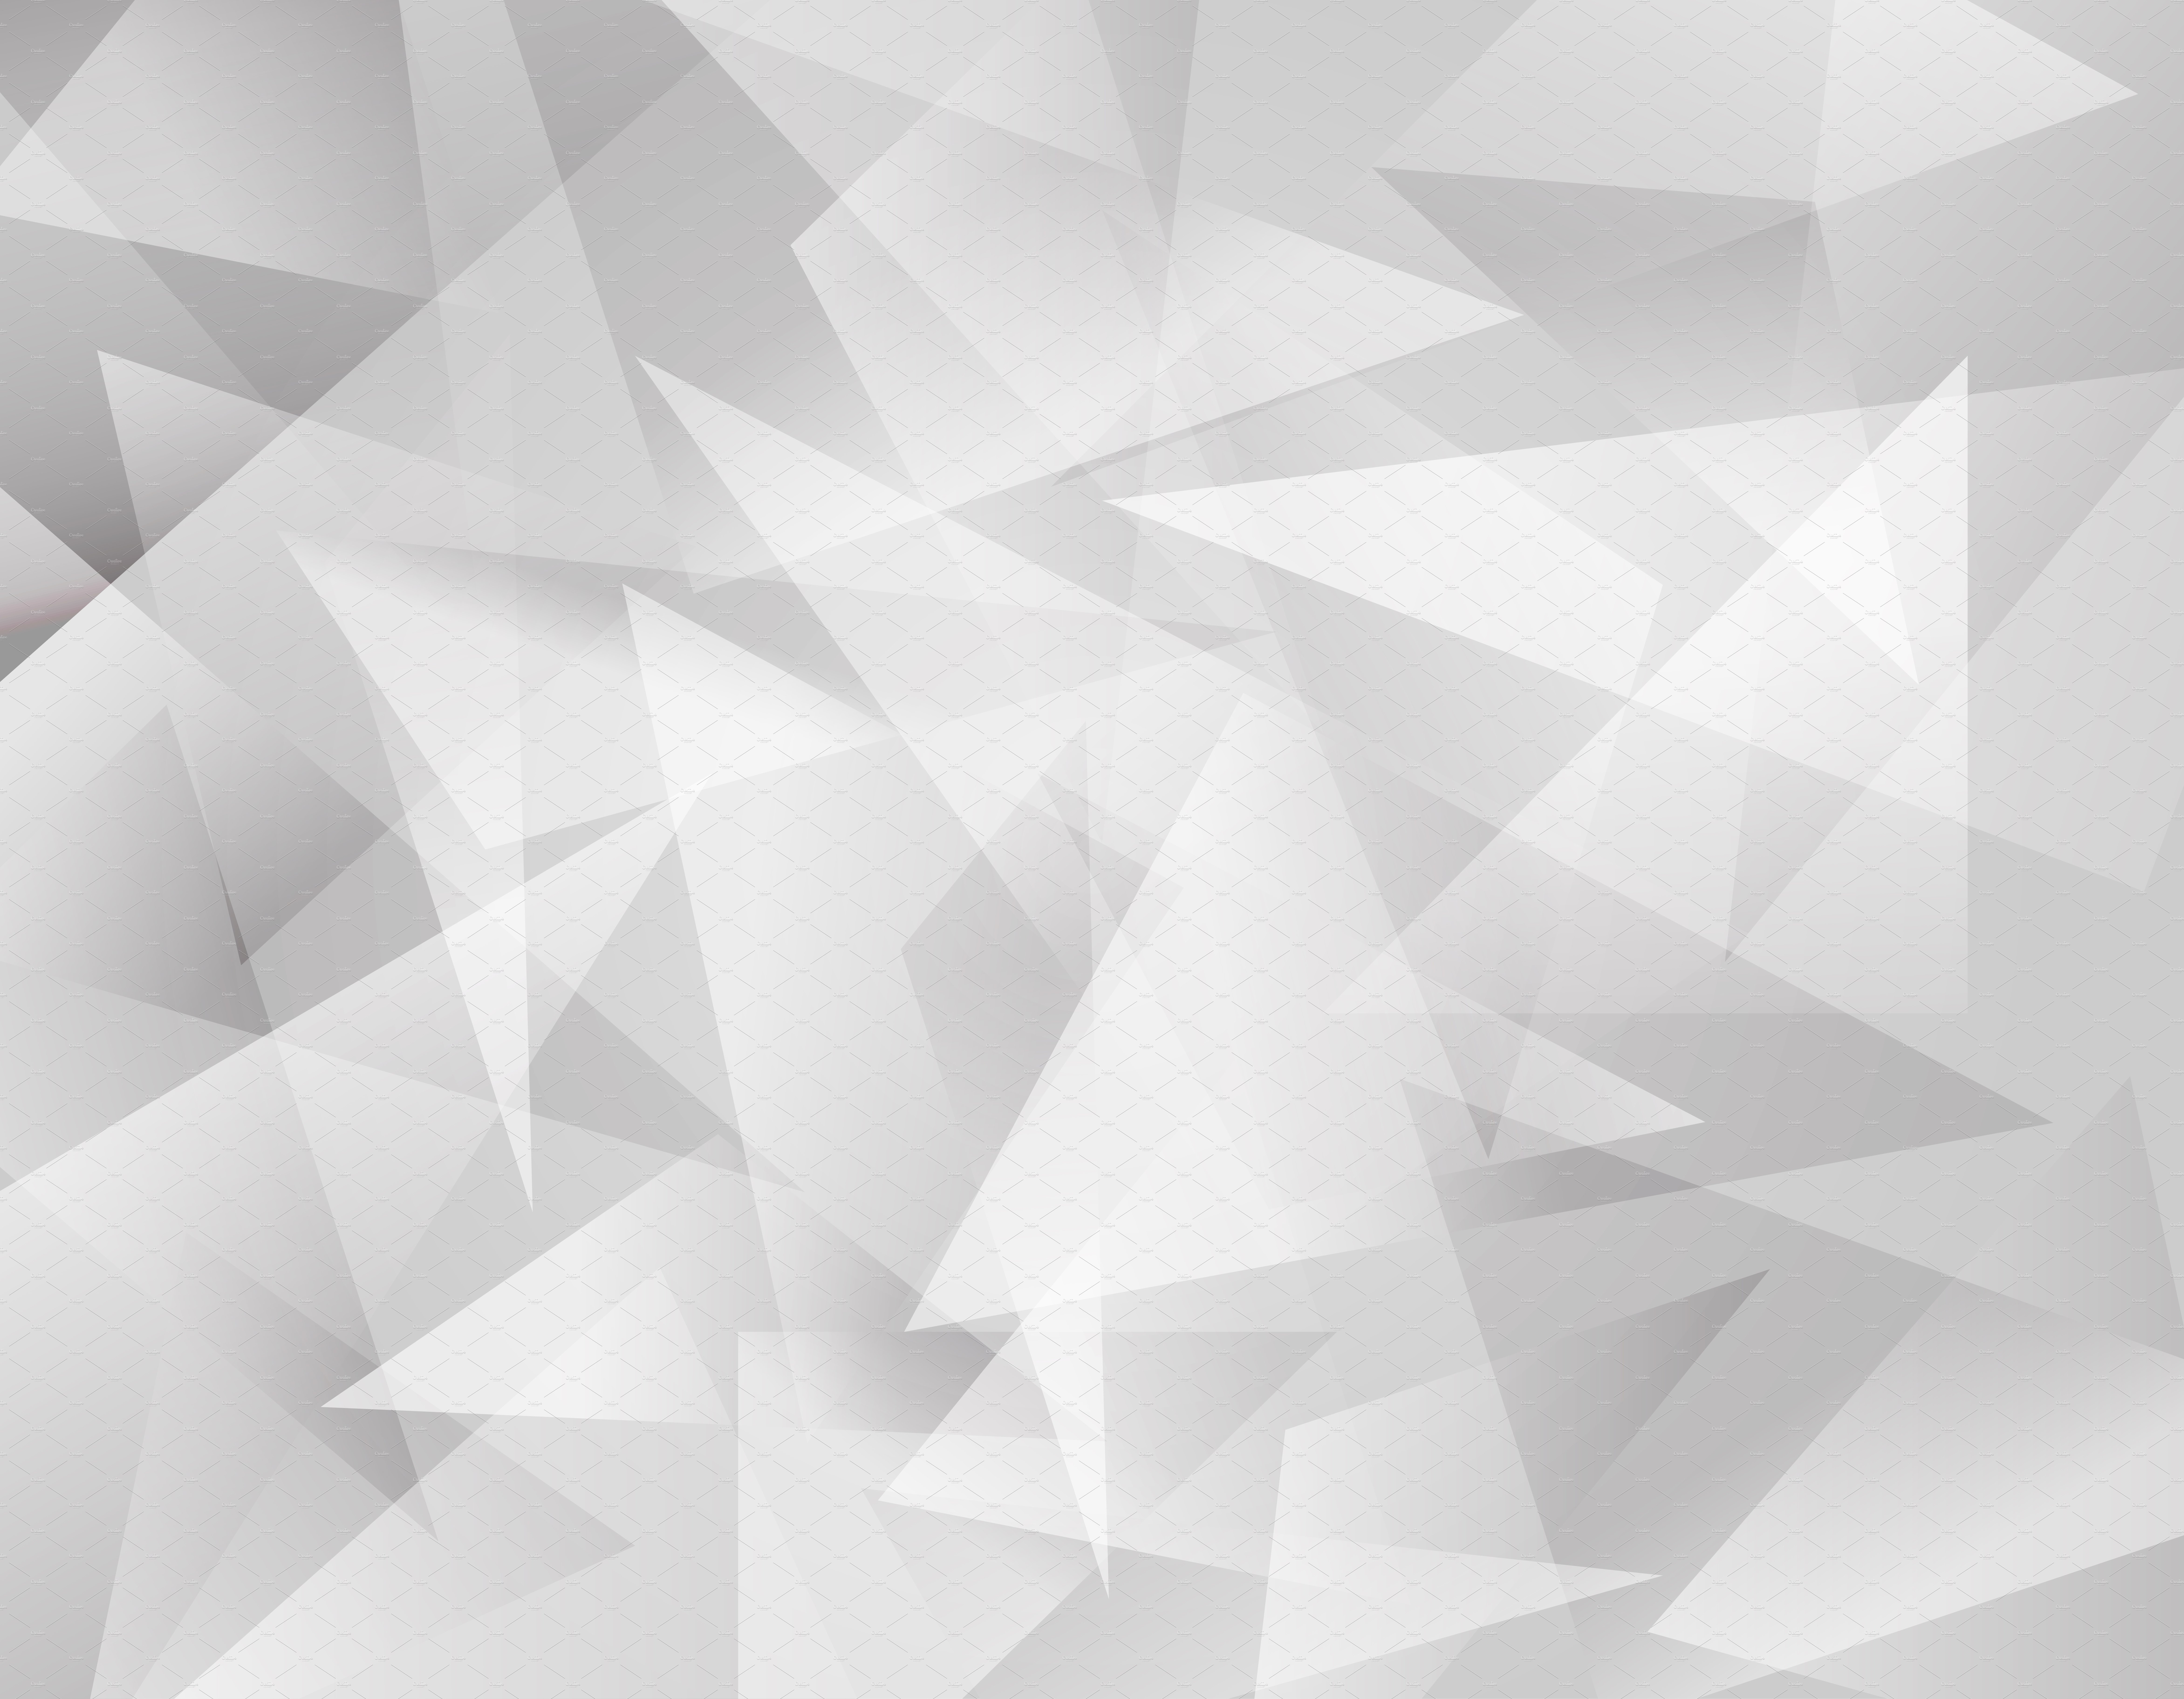 Material Design White Cards On White